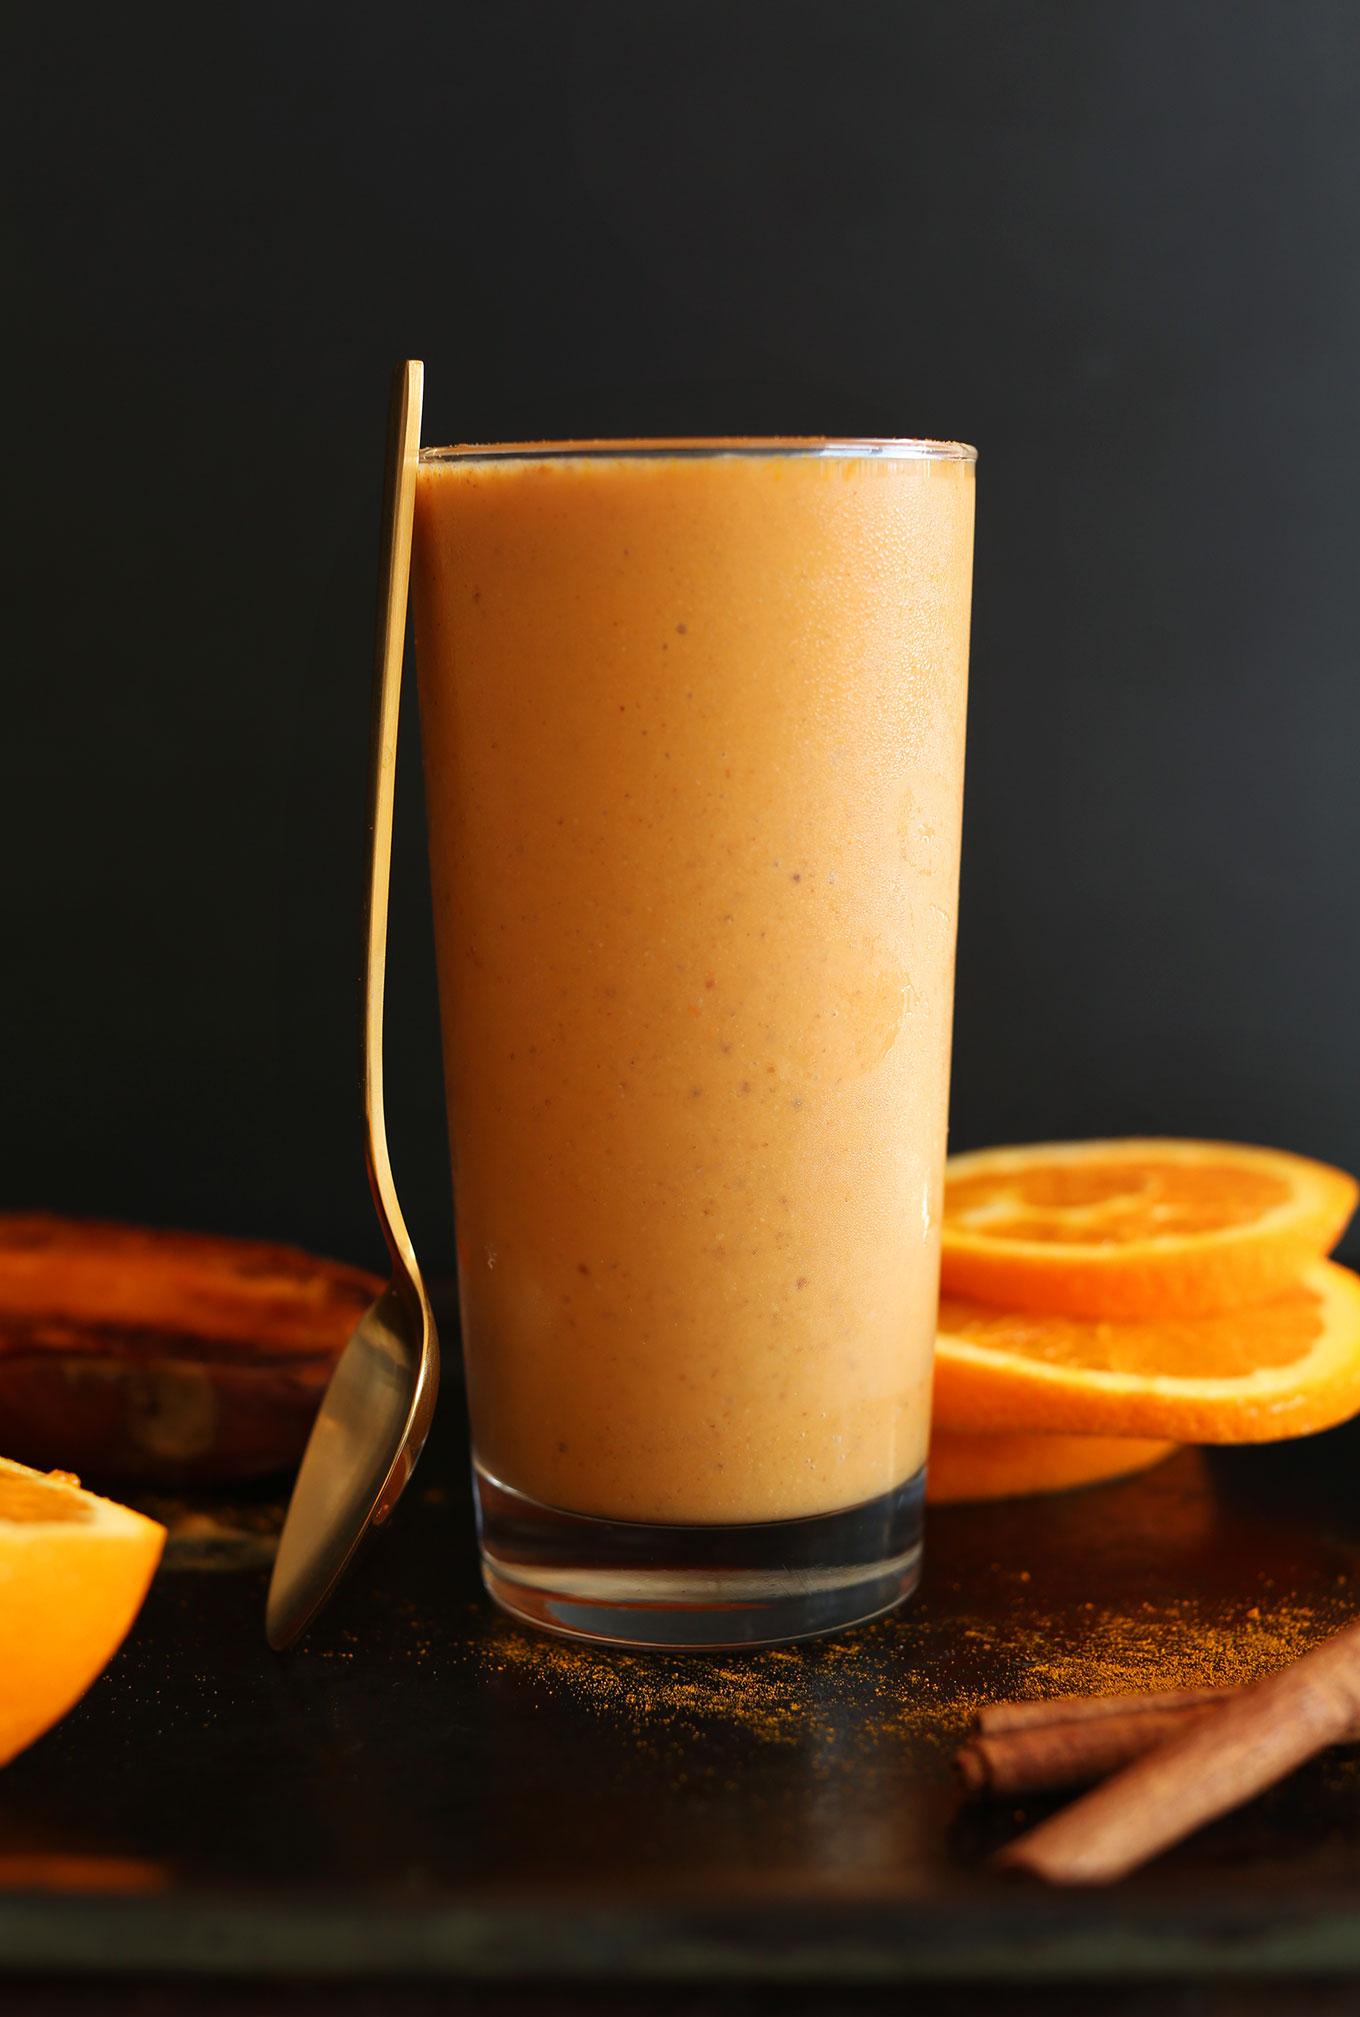 AMAZING-Sweet-Potato-Spice-Smoothie-with-lycopene-beta-carotene-vitamin-C-fiber-and-protein-Creamy-rich-sweet-DELICIOUS-vegan-healthy.jpg